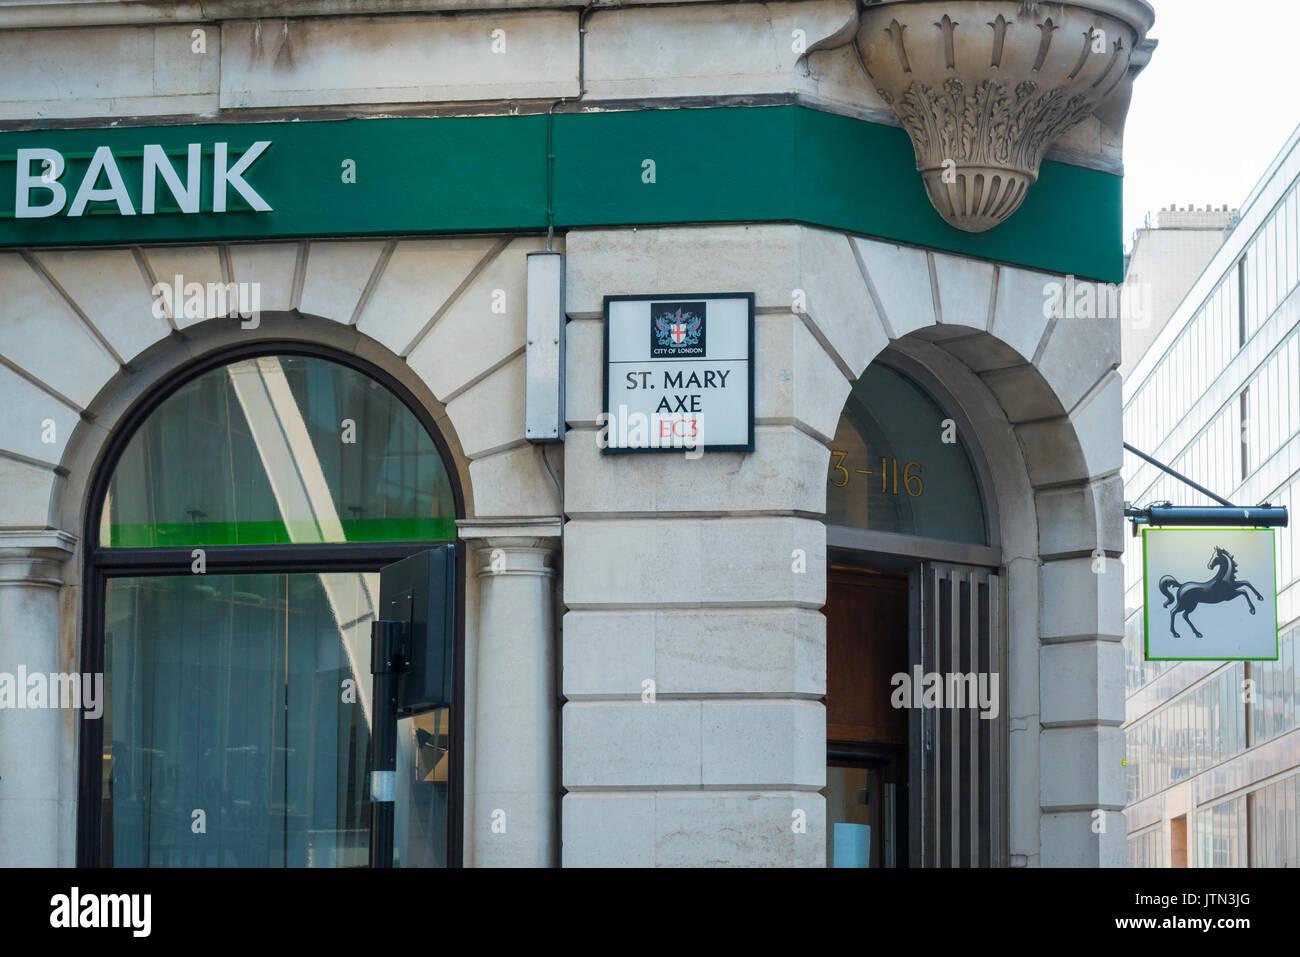 UK London City EC3 Financial Centre Center Lloyds Bank branch St Mary Axe road sign logo black horse street scene - Stock Image